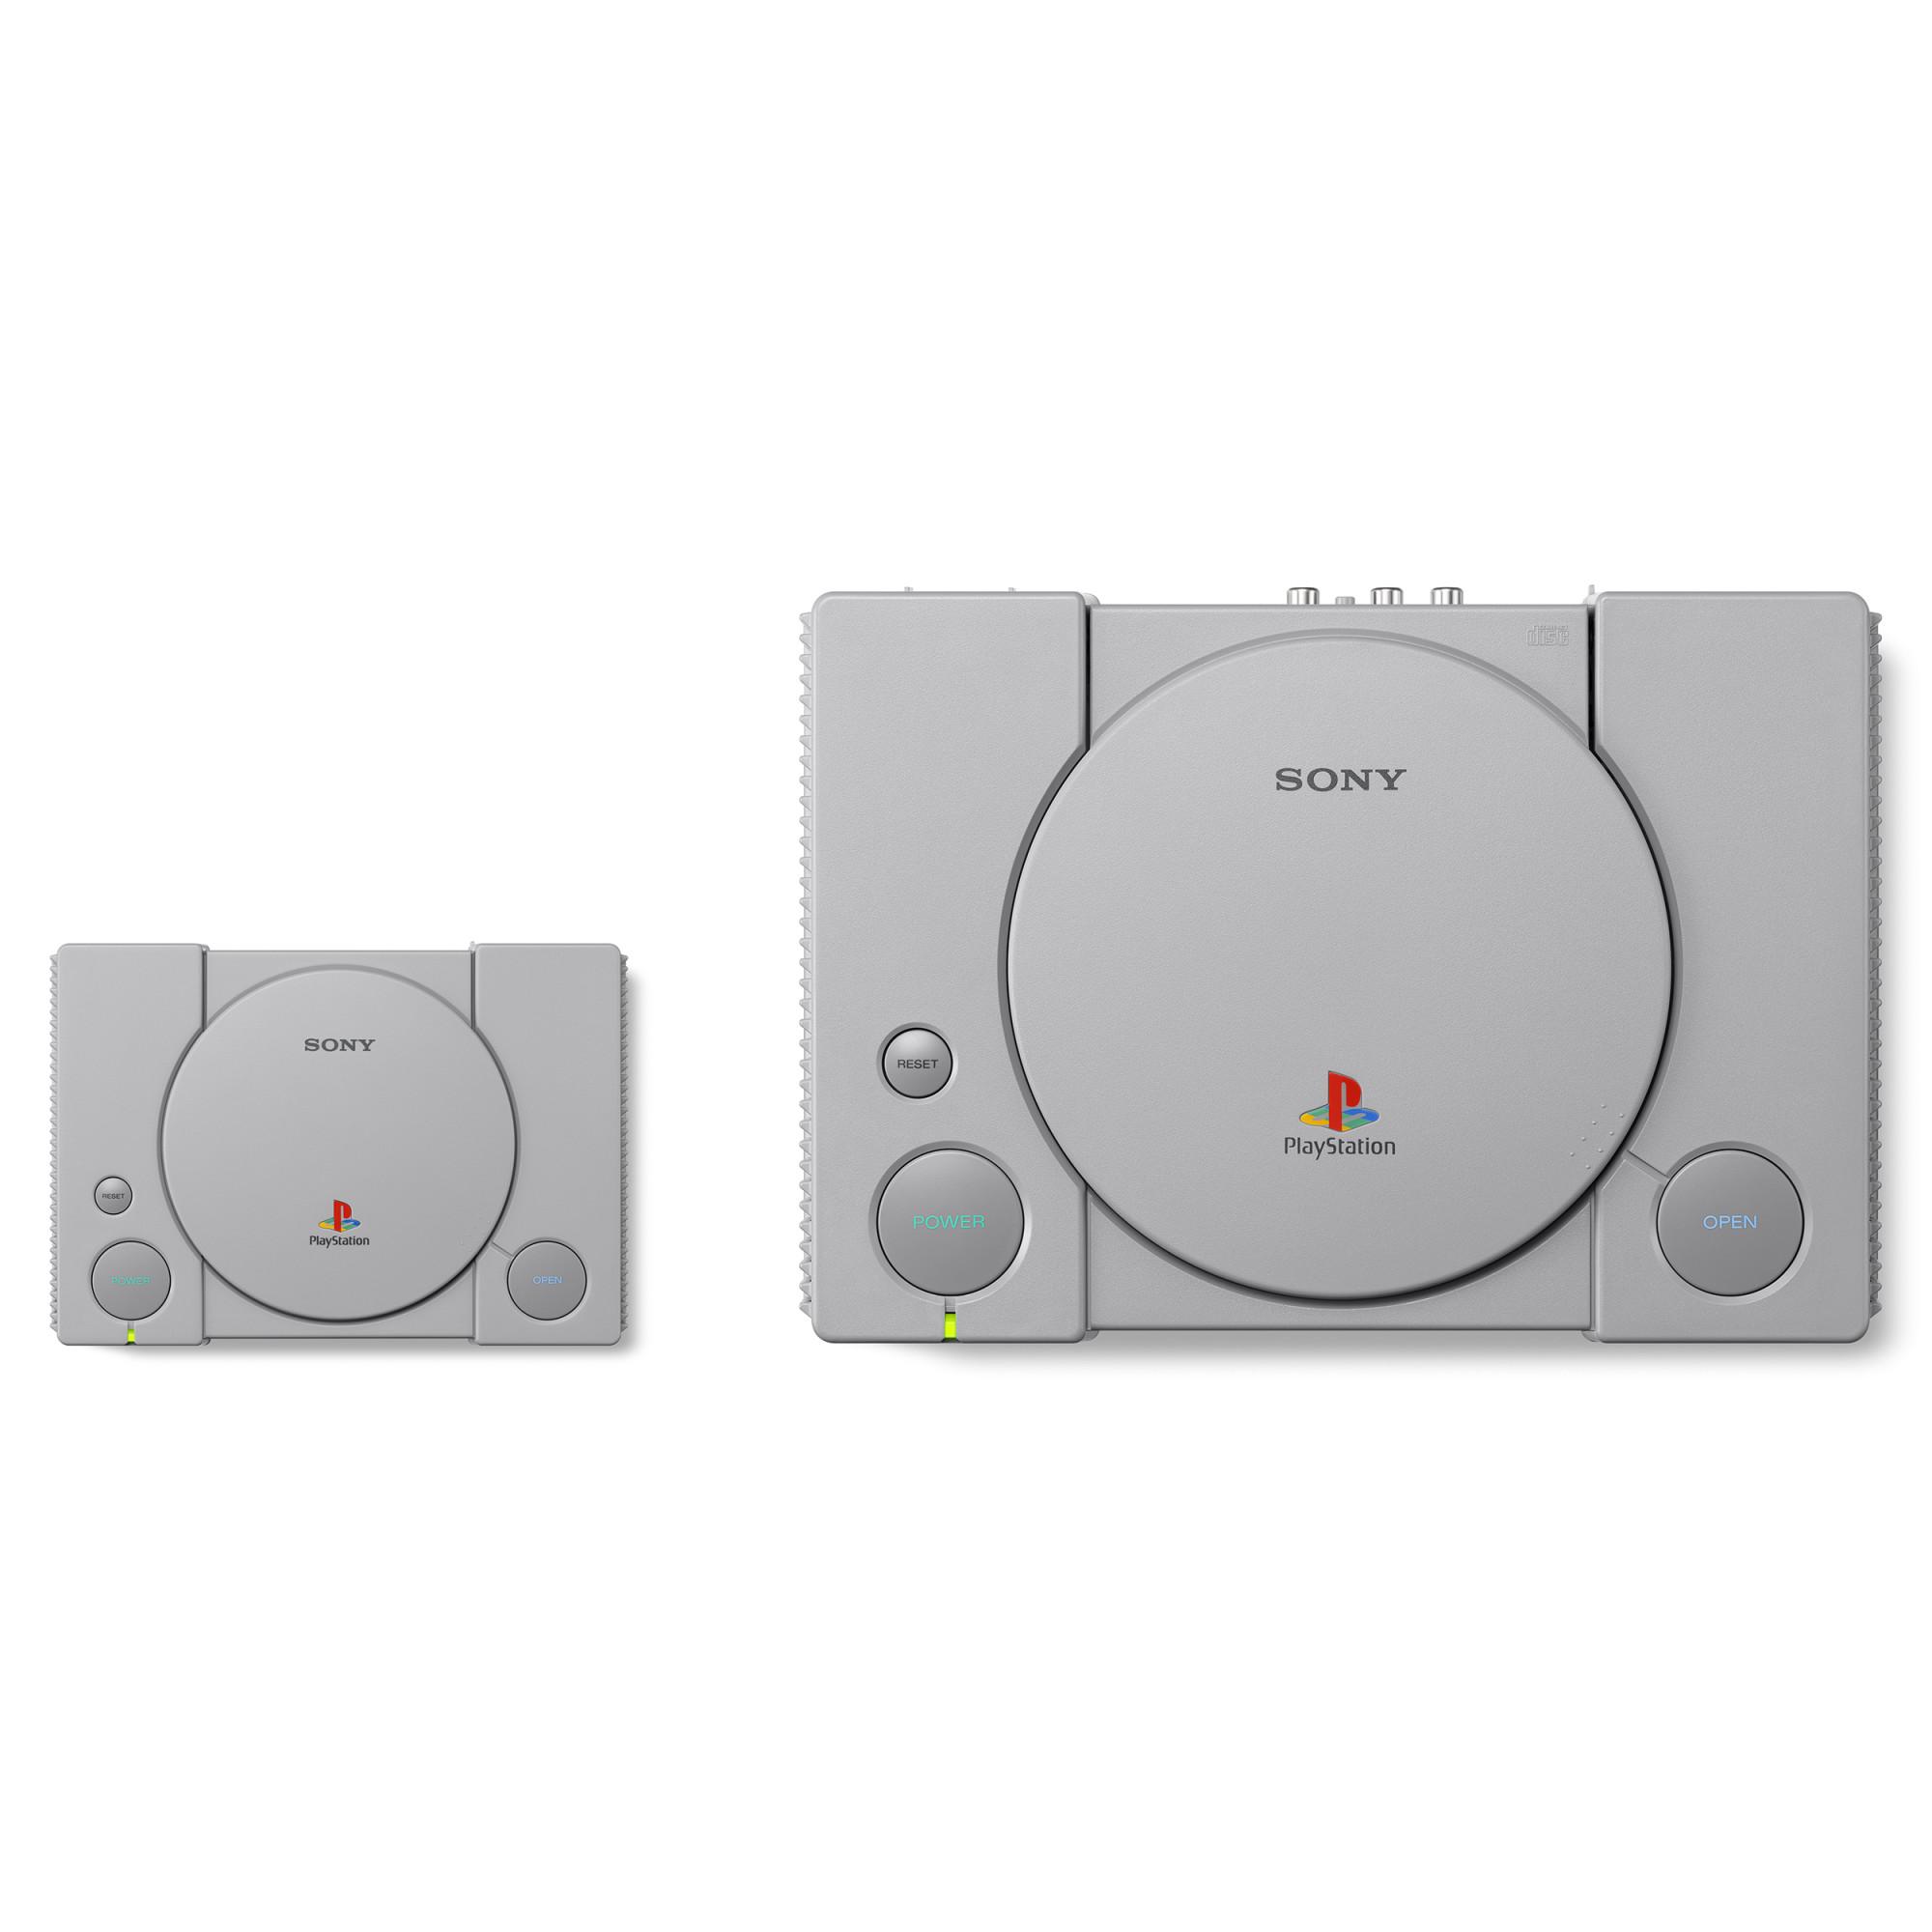 Consola Sony Playstation Classic + 20 jocuri preinstalate 7